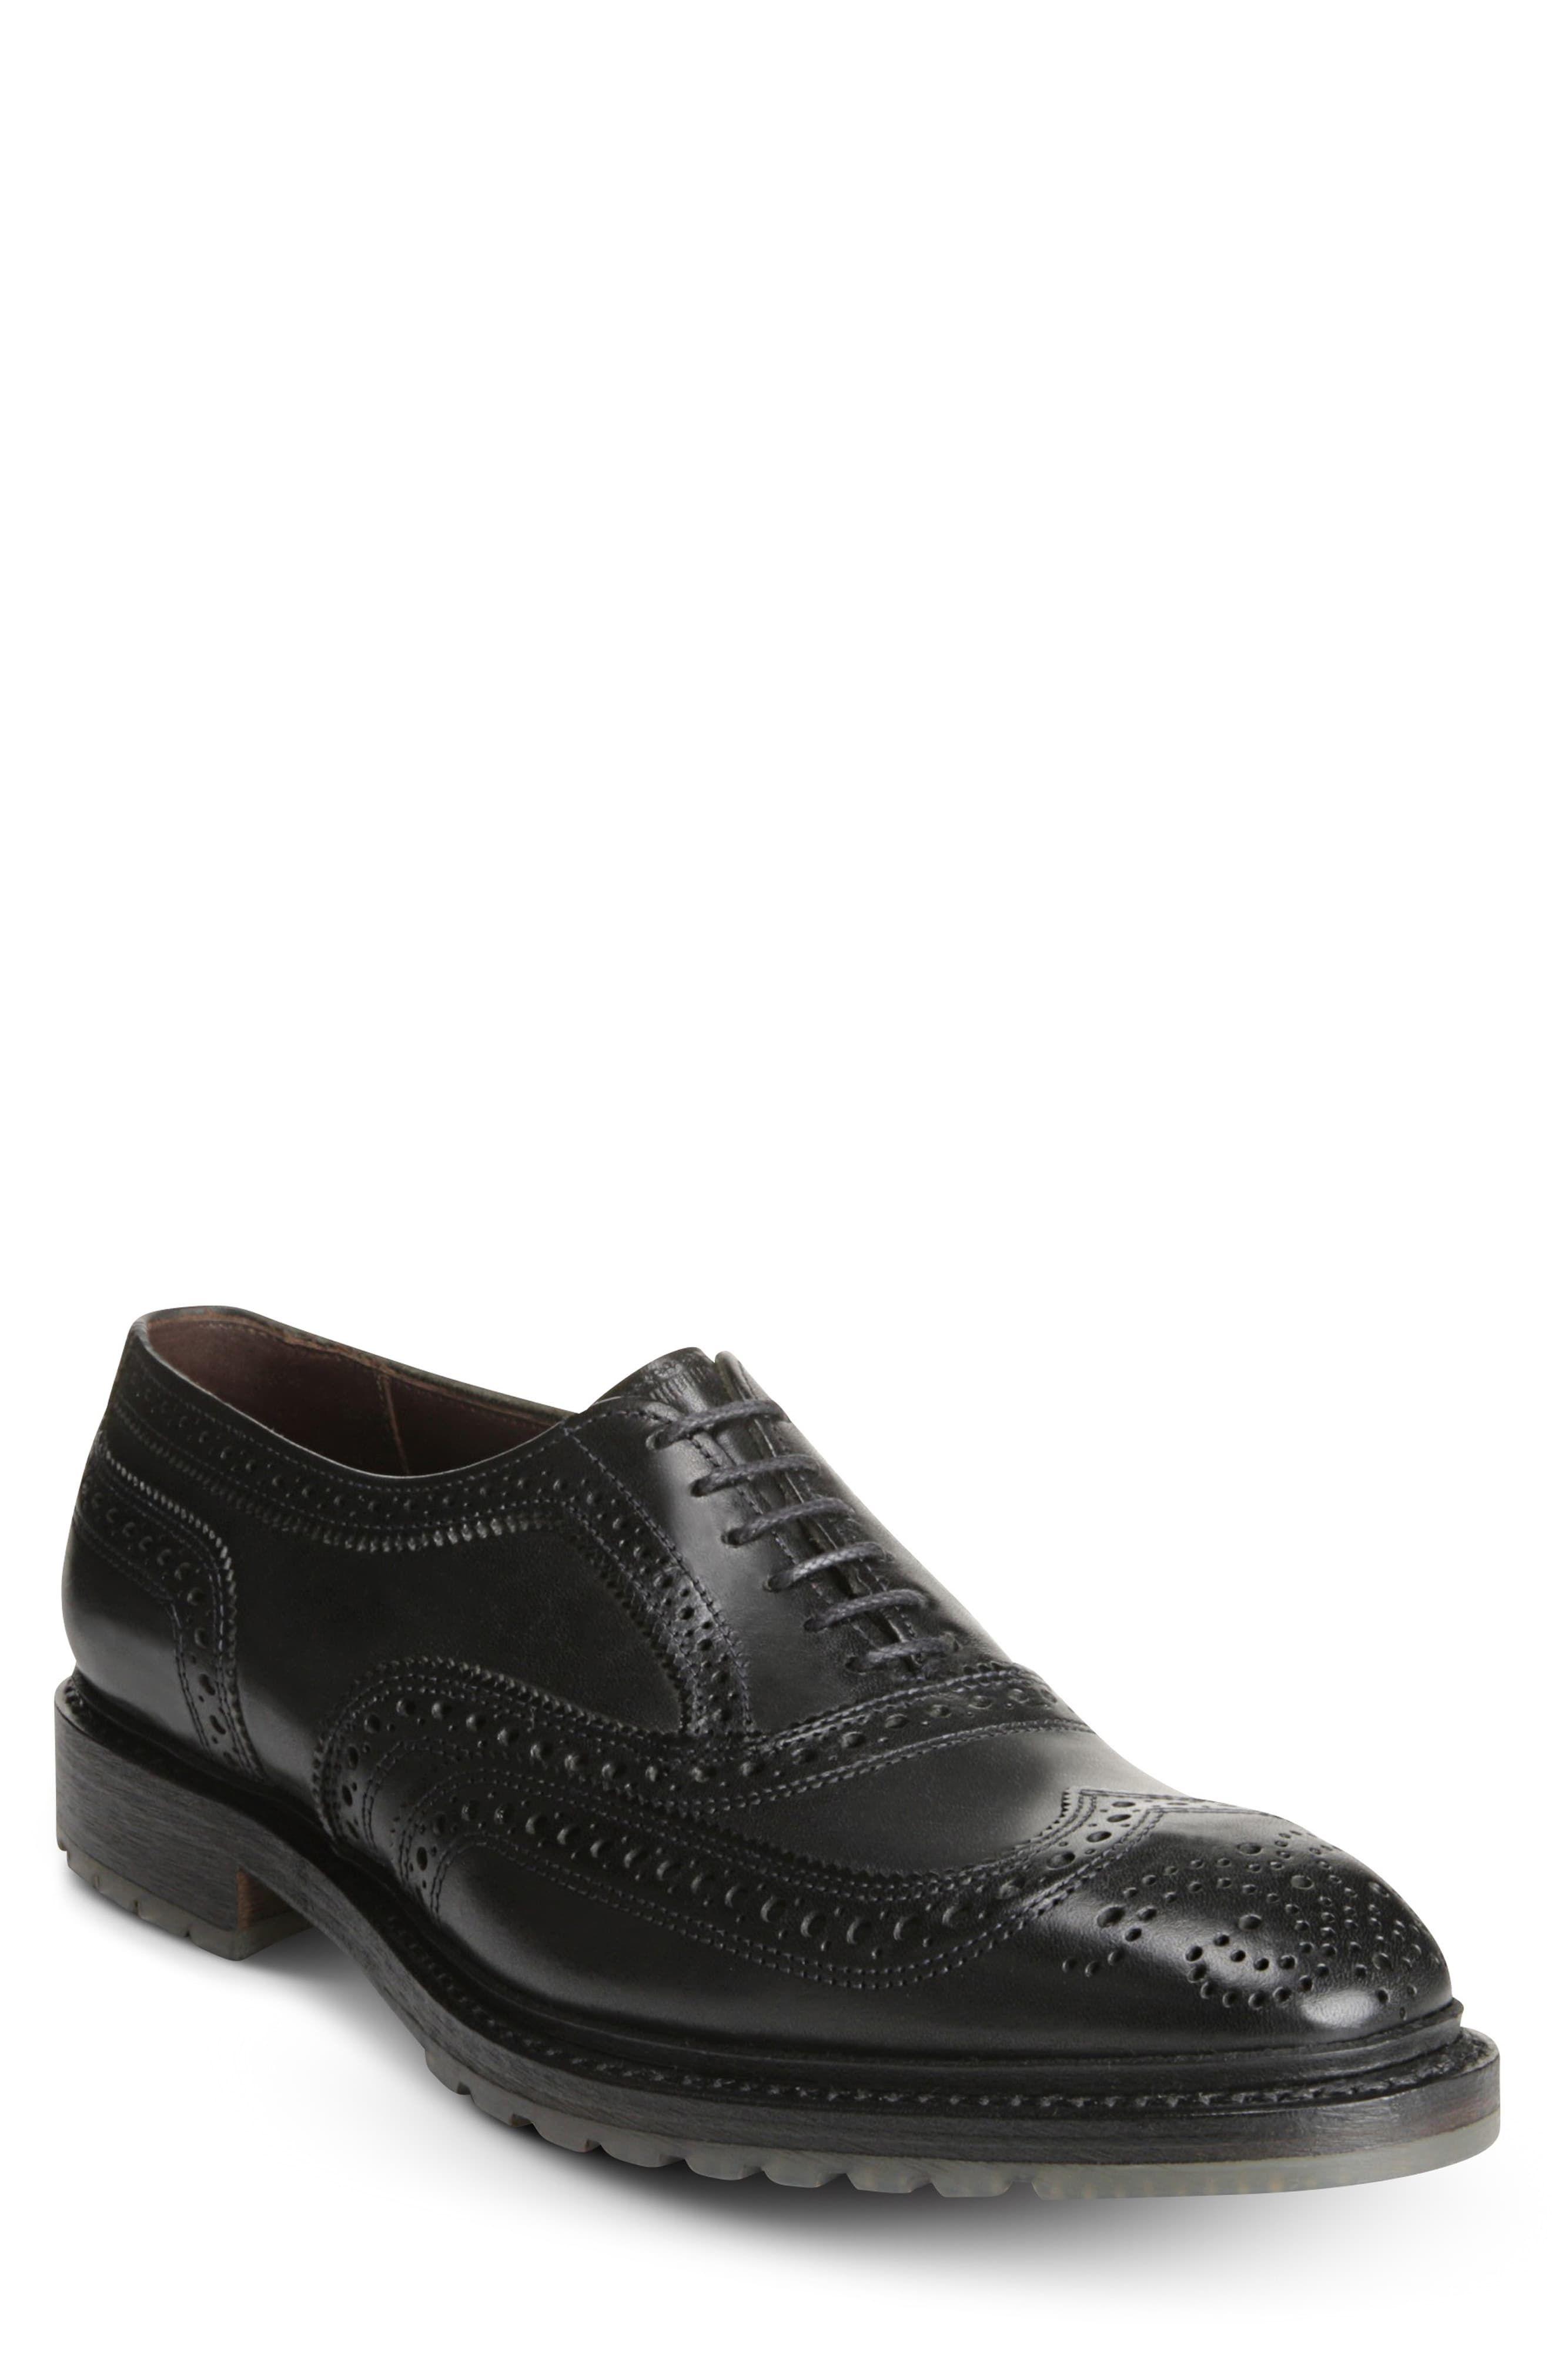 Men's Allen Edmonds Mctavish Lugged Wingtip Oxford, Size 8 D